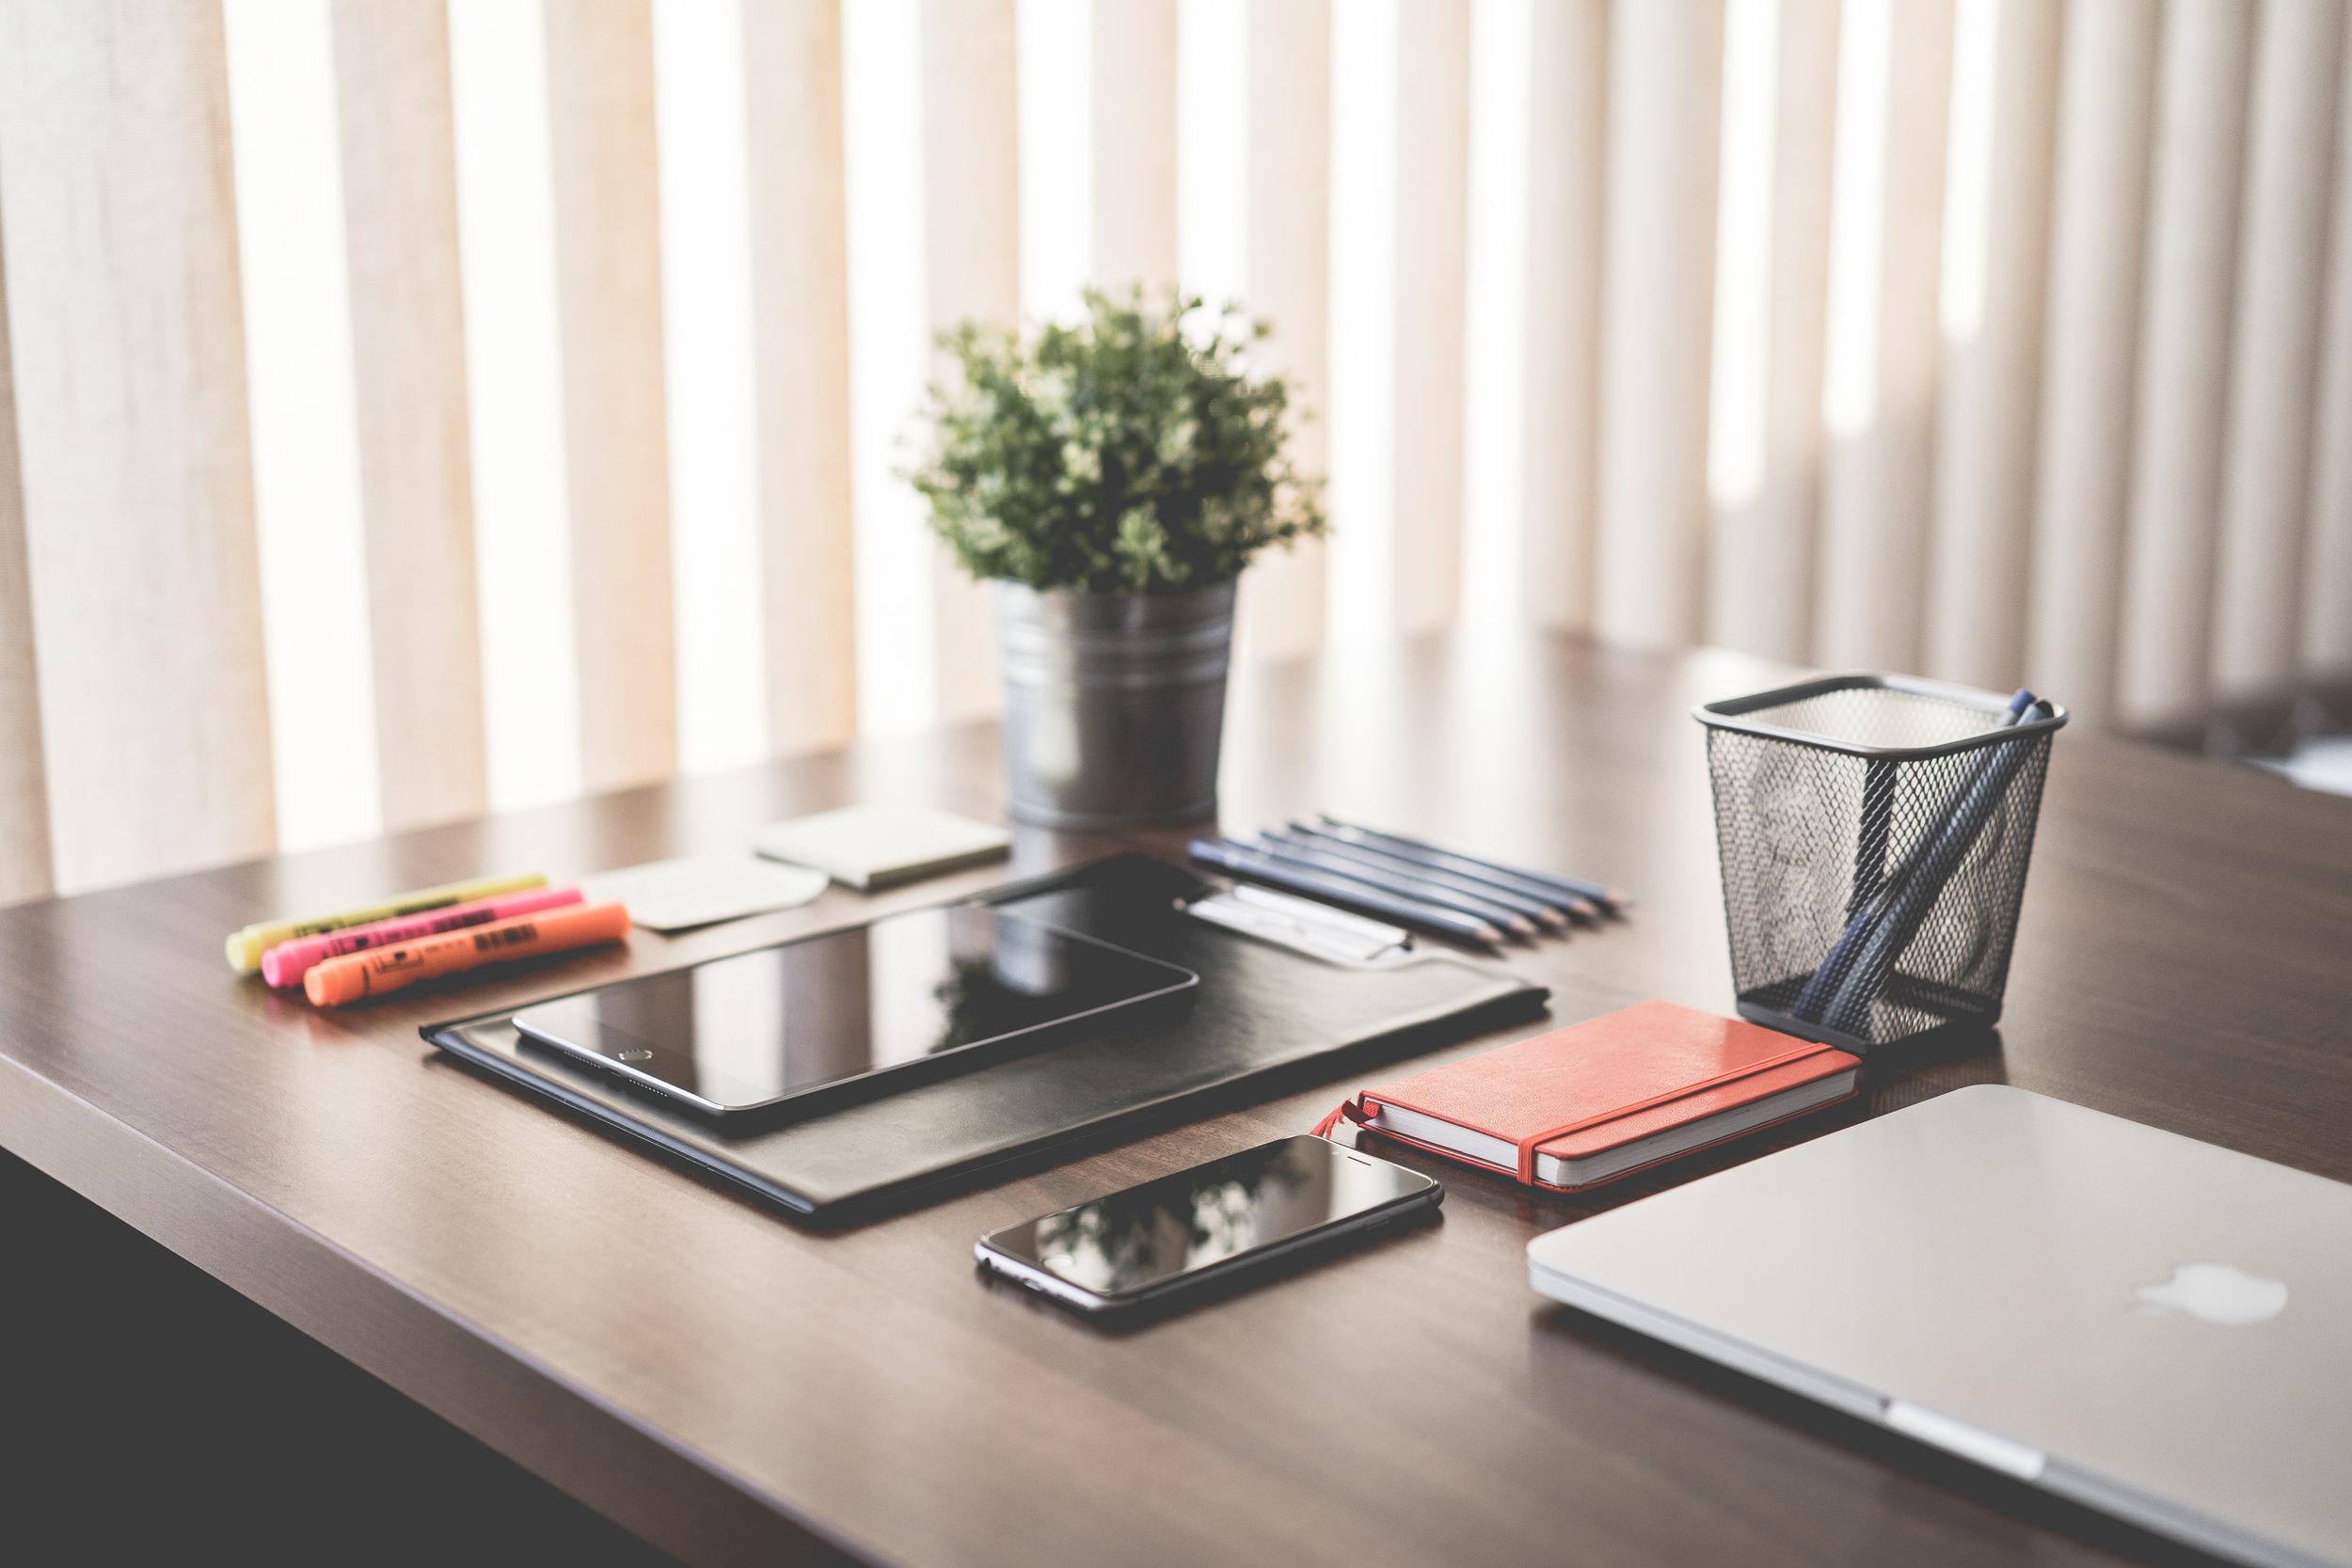 simple-minimalistic-home-office-with-equipment-on-wooden-desk-picjumbo-com.jpg